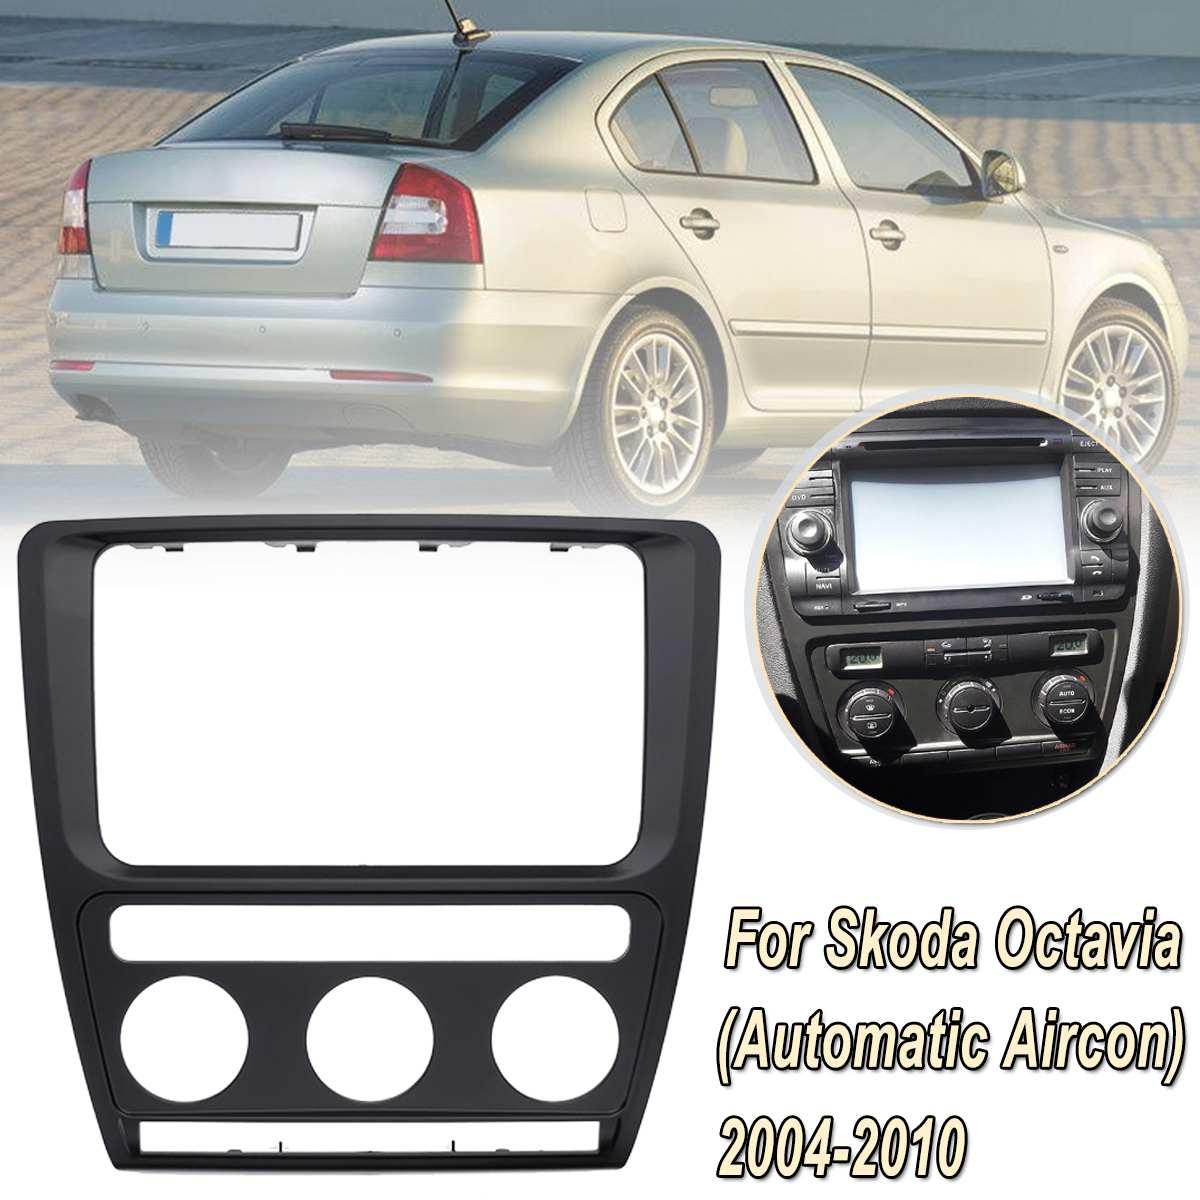 Radio Panel Dash Fascia Plate Frame For Skoda Octavia (Automatic Aircon)  2004-2010 Adio DVD Stereo CD Panel Dash Kit Trim